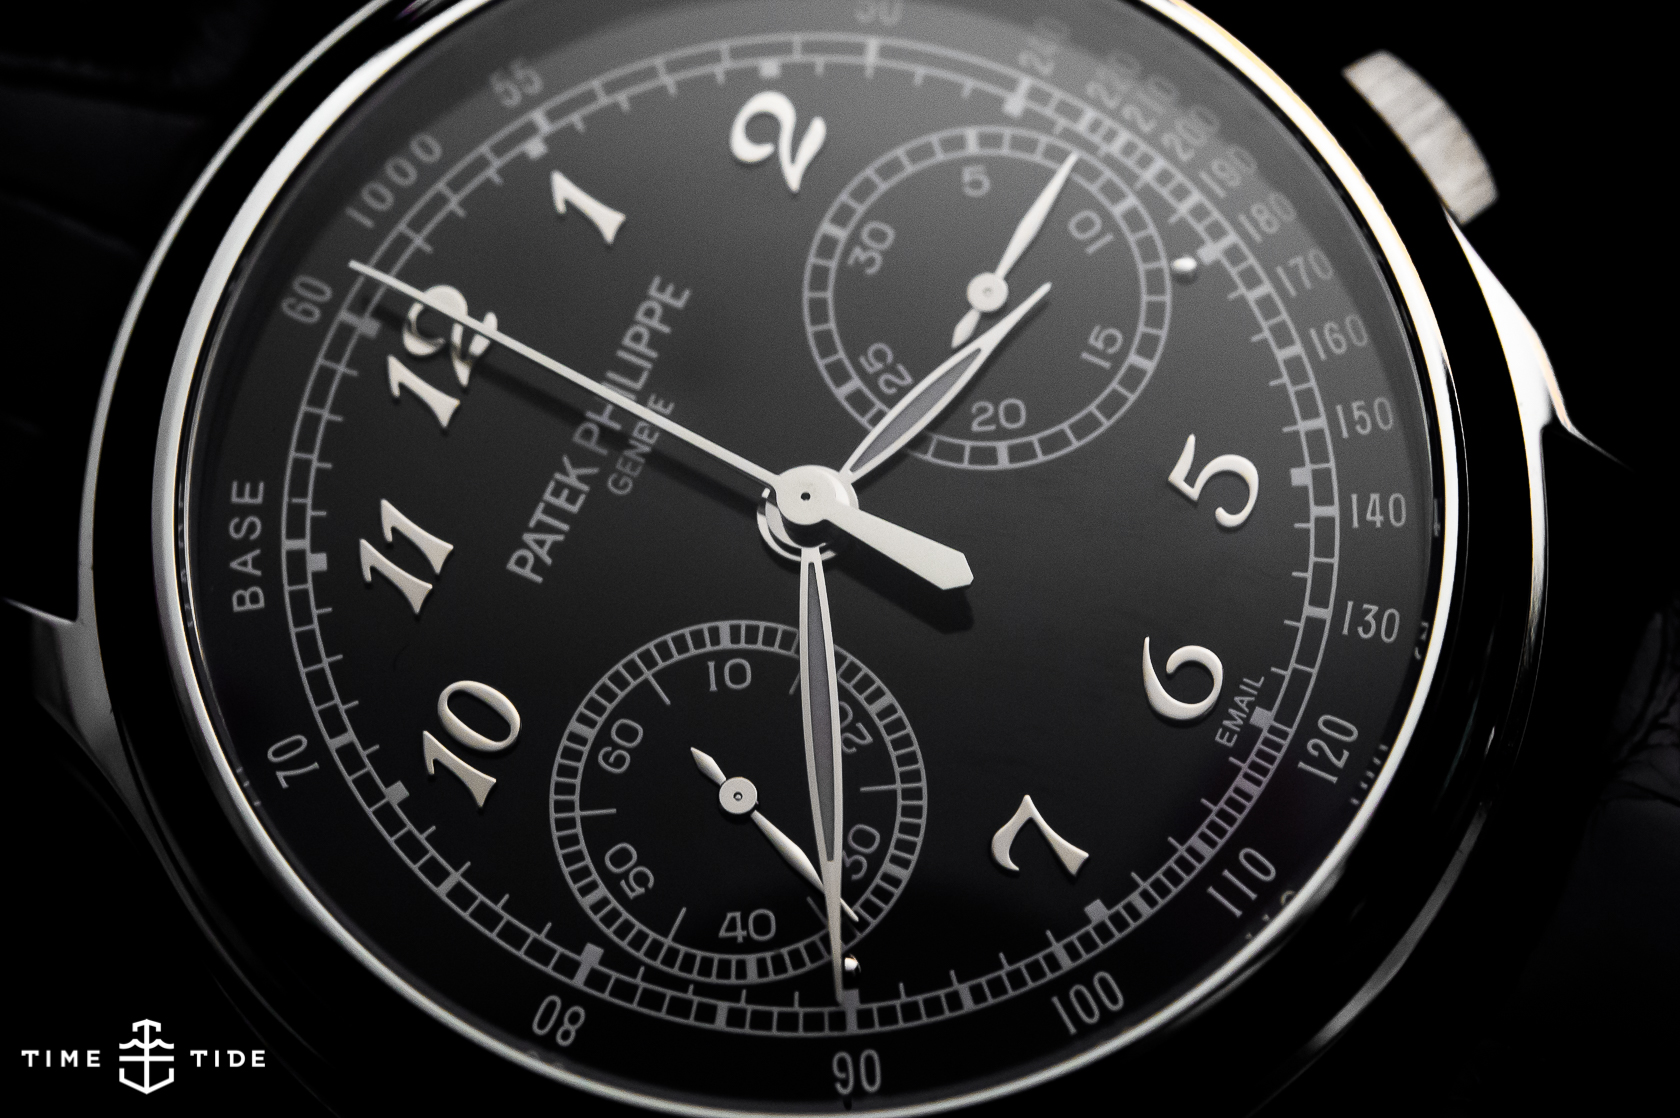 Patek Philippe split-seconds chronograph Ref.5370P-1